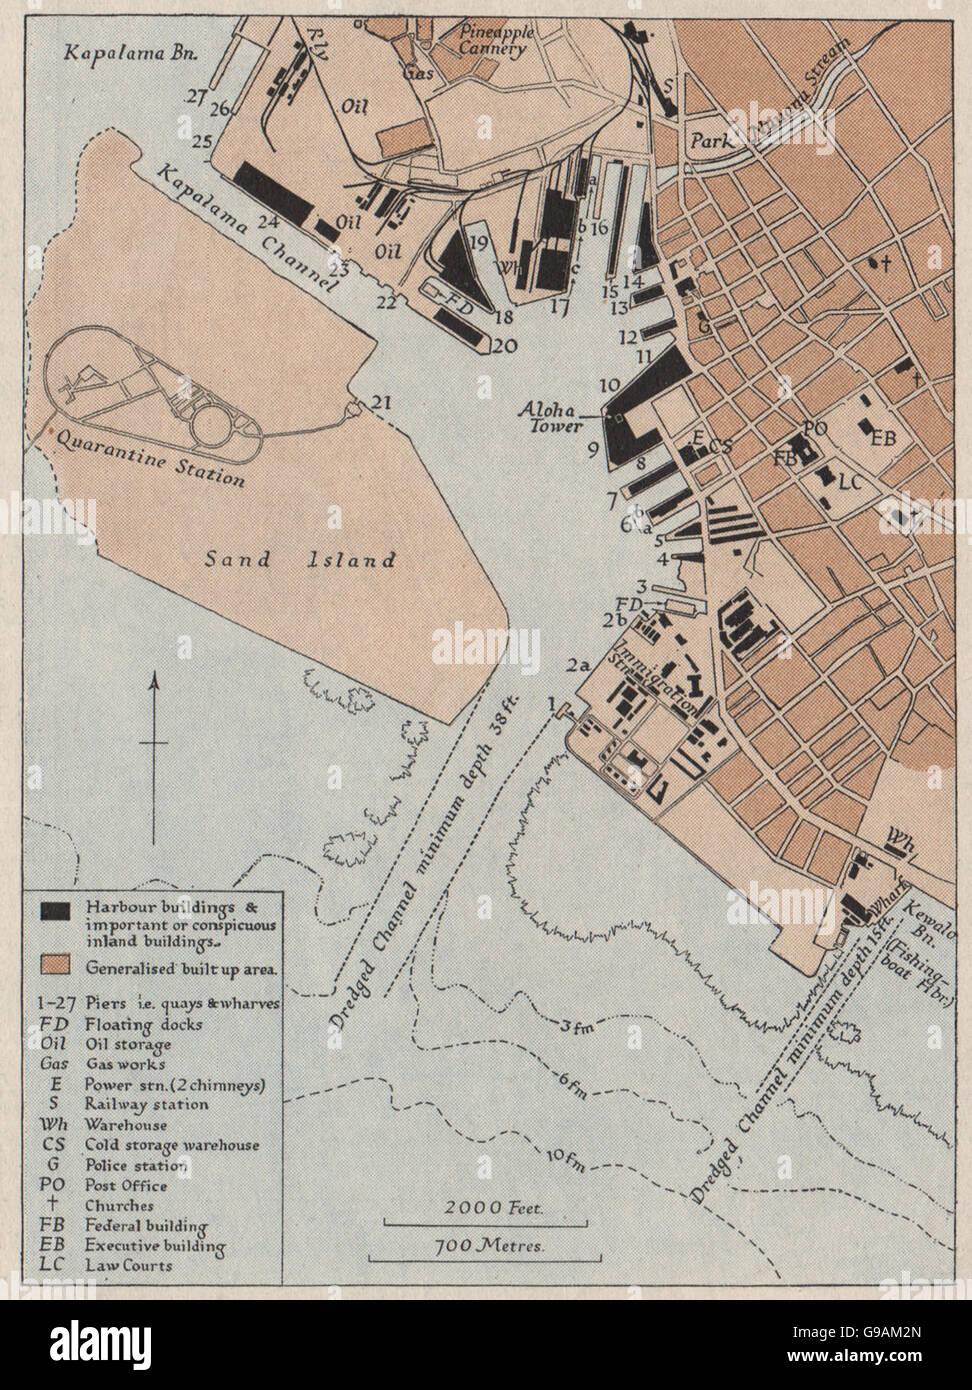 HAWAII: The port of Honolulu. WW2 ROYAL NAVY INTELLIGENCE MAP, 1943 - Stock Image